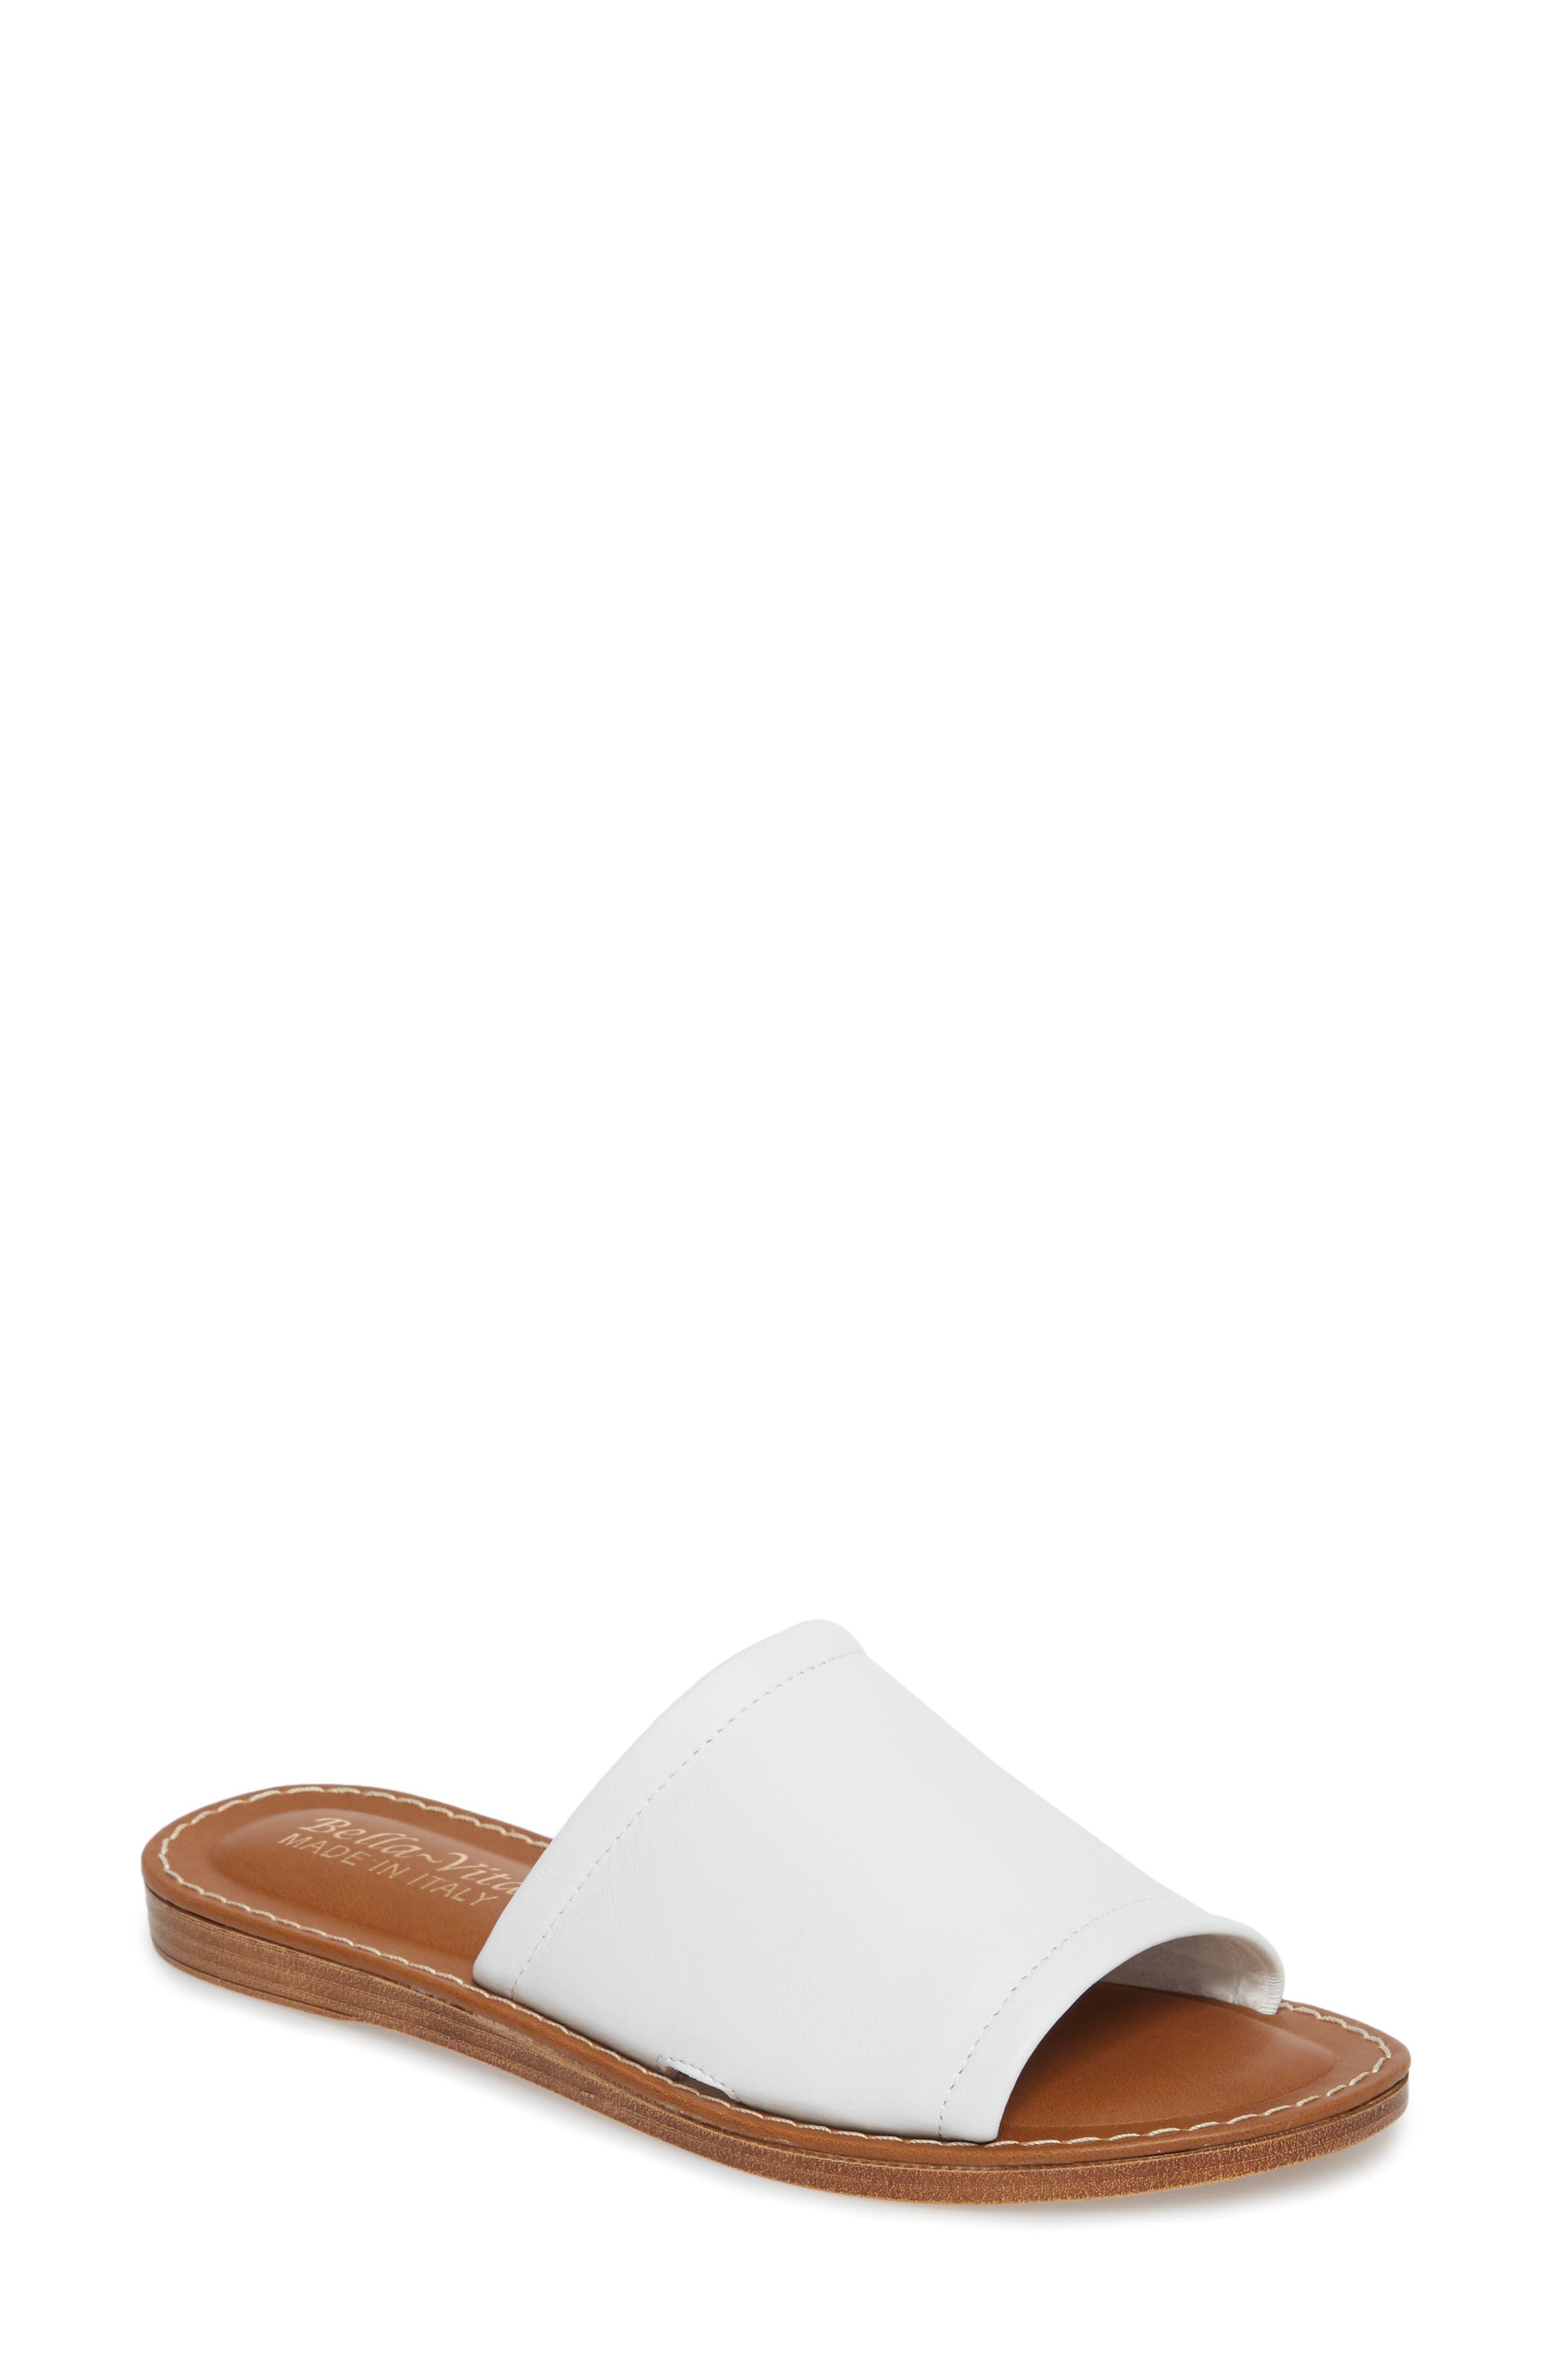 Ros Slide Sandal,                         Main,                         color, WHITE LEATHER